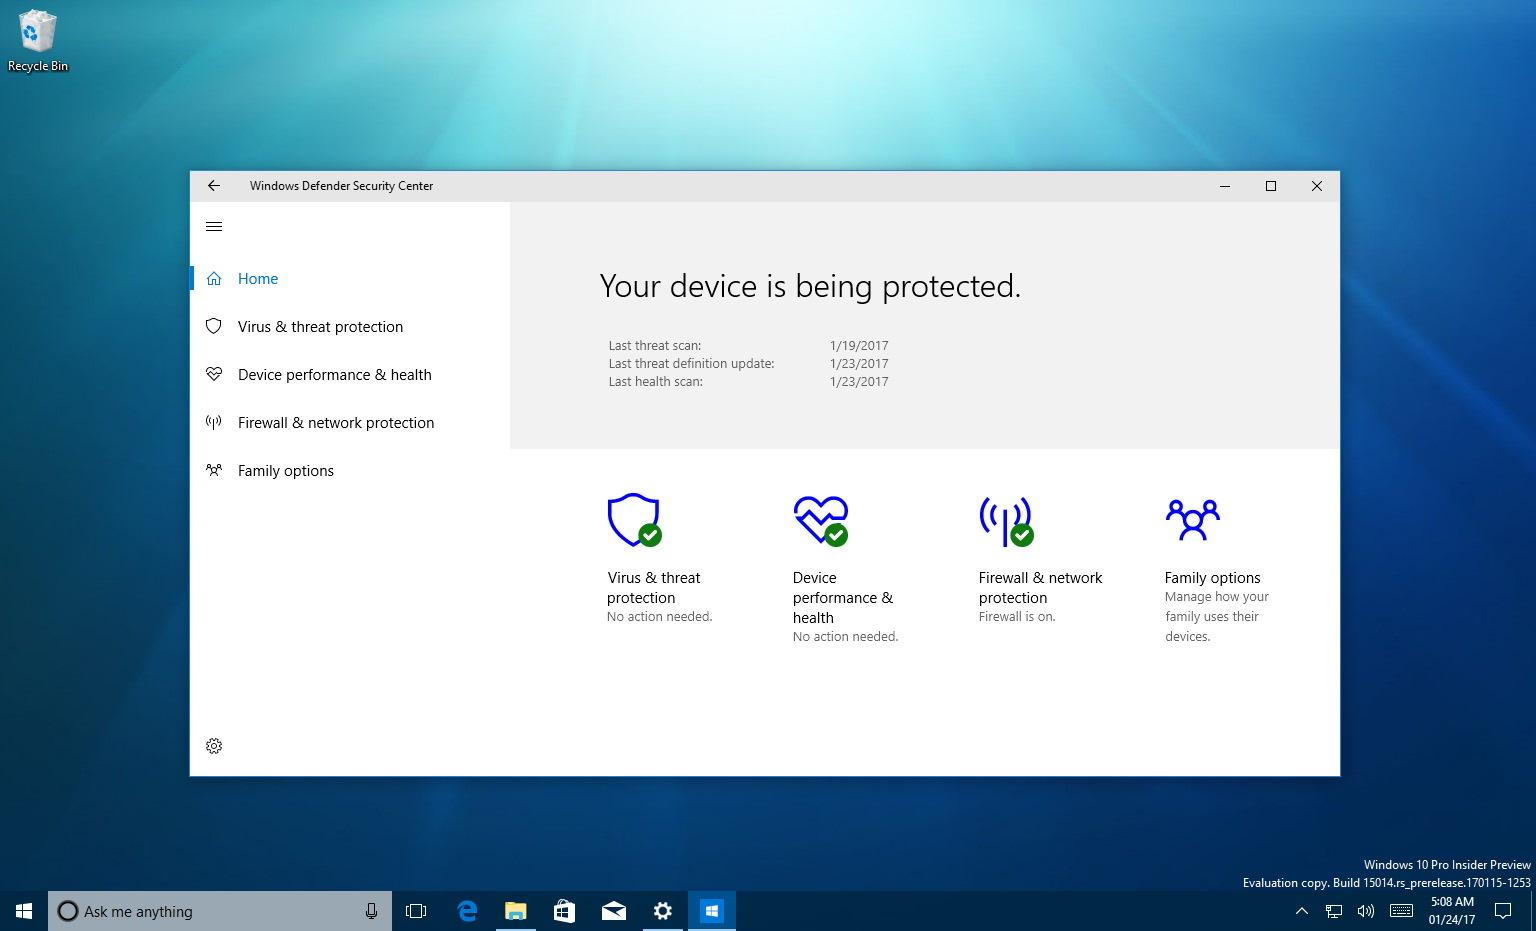 Windows Defender Security Center on Windows 10 Creators Update